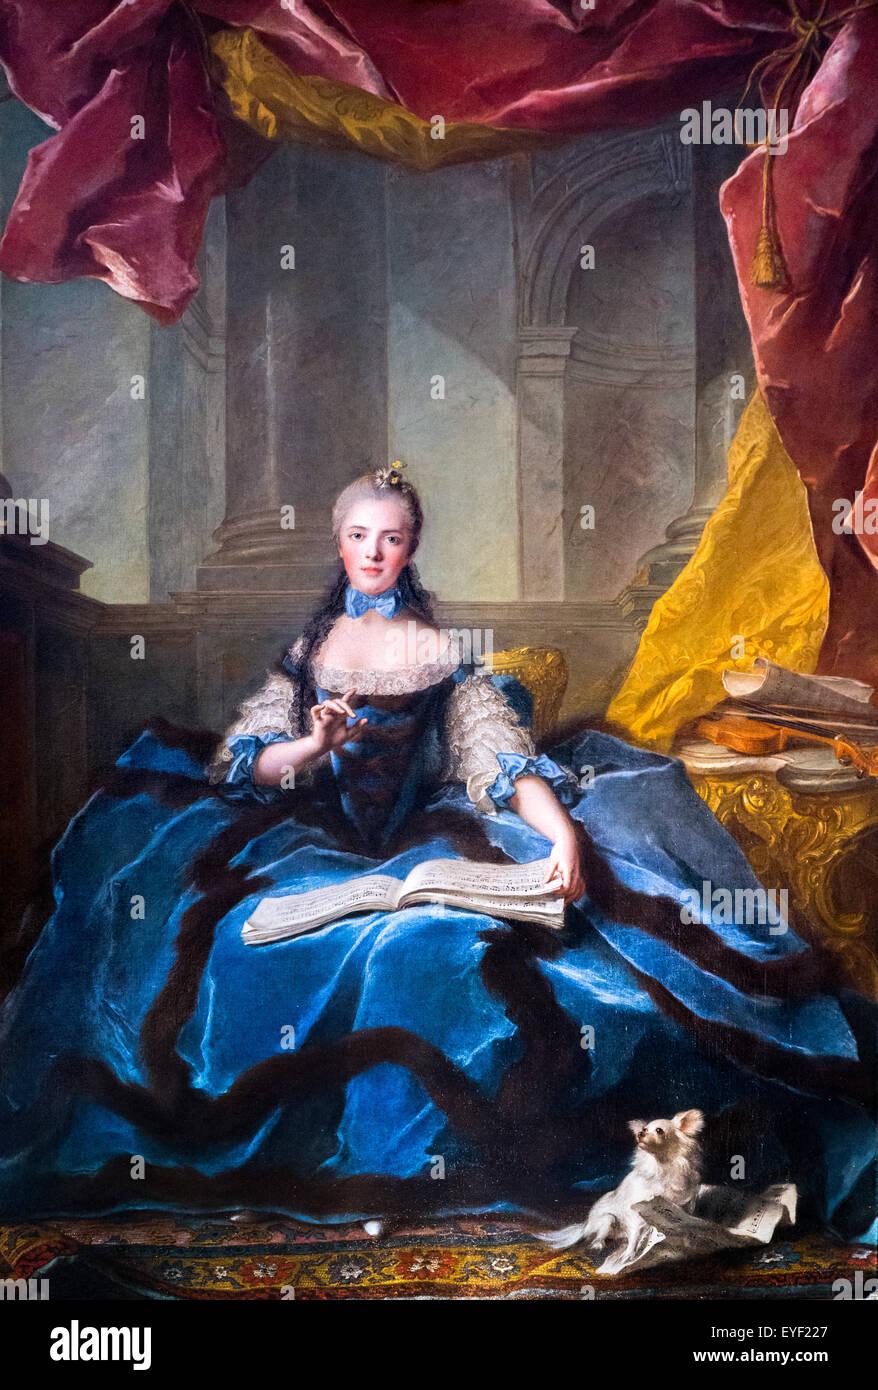 Frau Adelaide Solfiant 12.10.2013 - Sammlung des 18. Jahrhunderts Stockbild